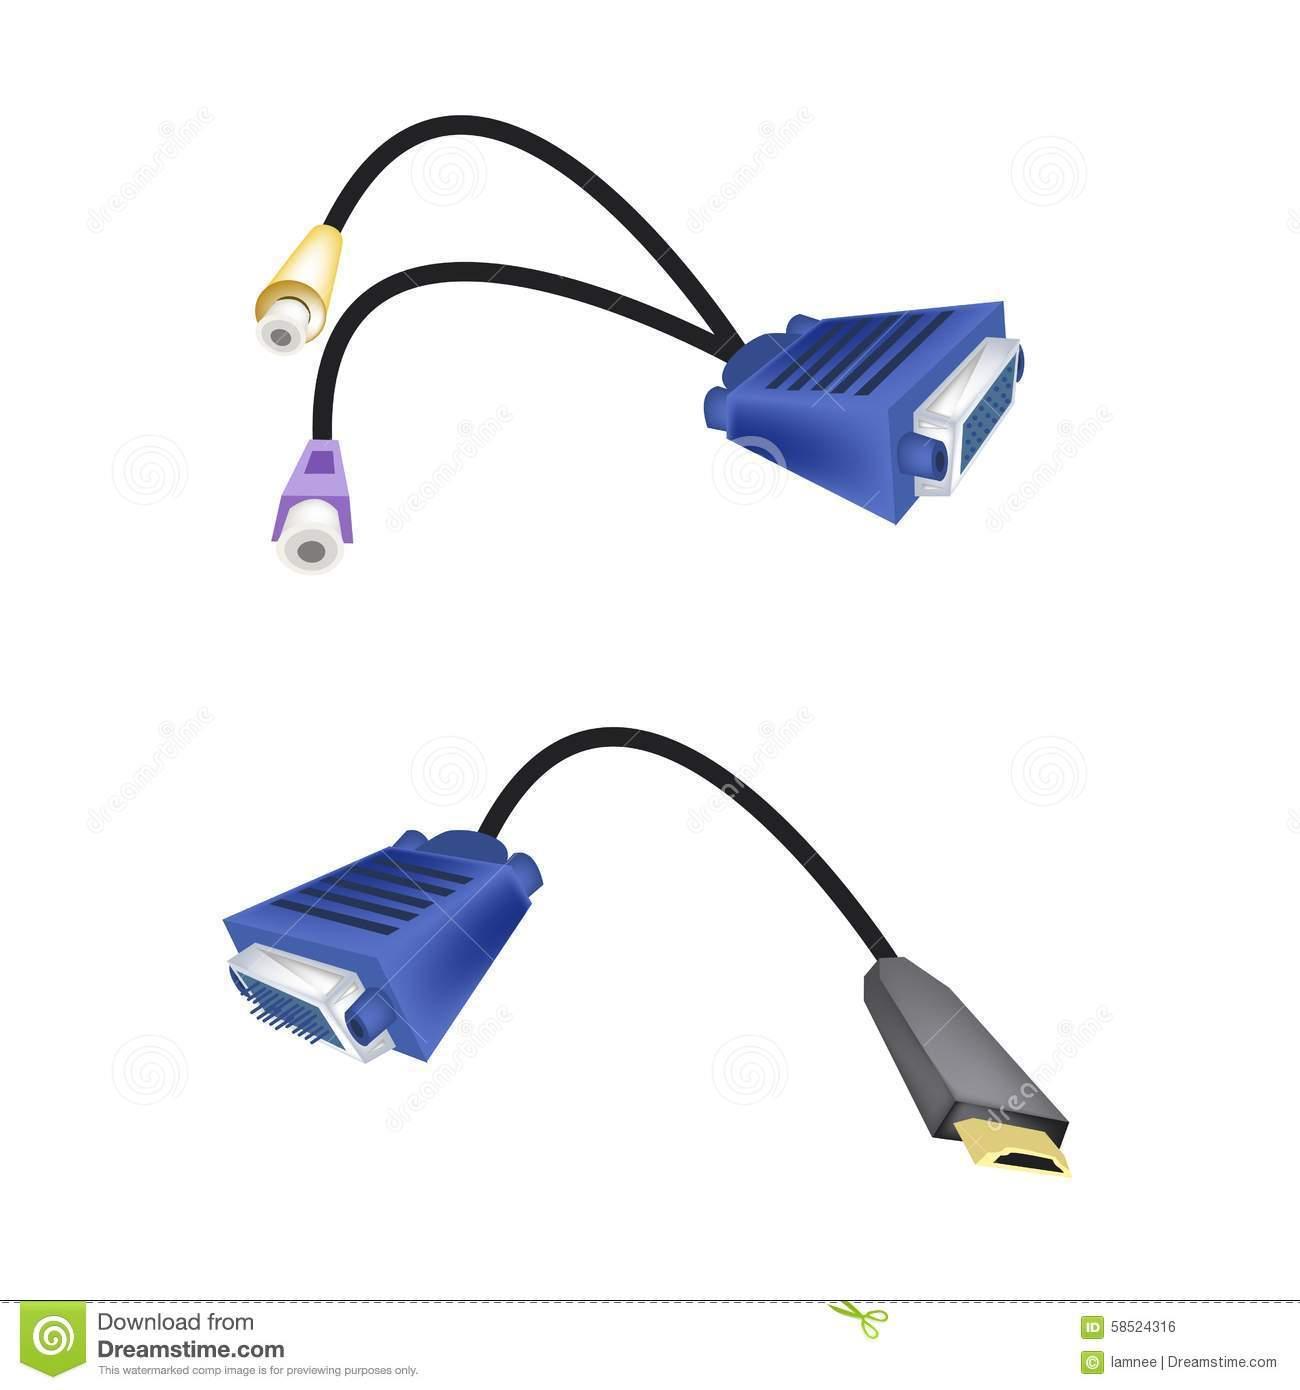 Vga To Phono Wiring Diagram